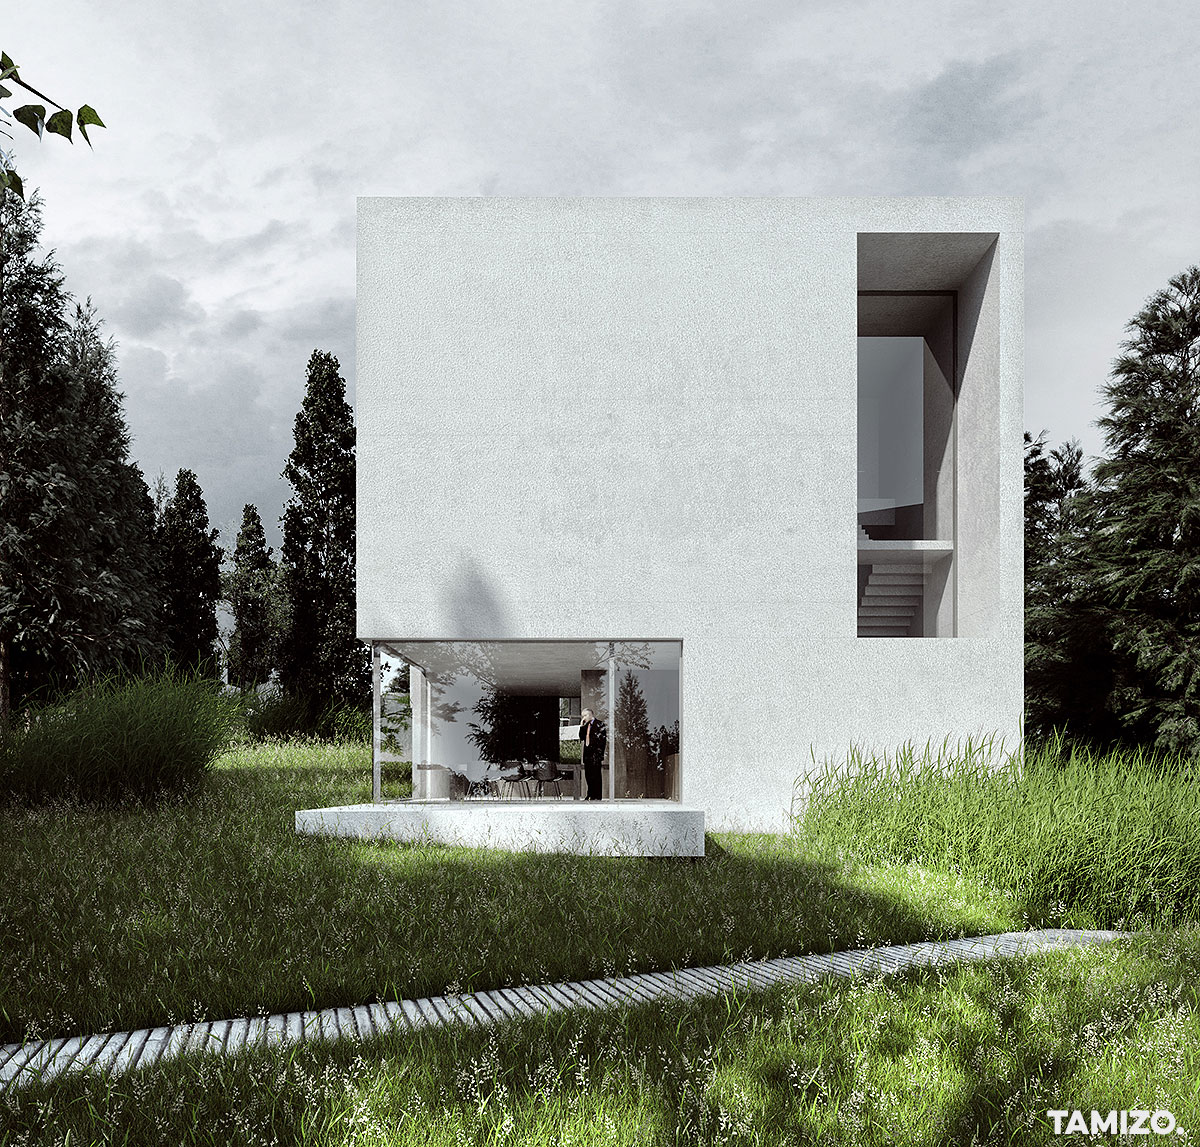 A061_tamizo_architects_competition_tbilisi_georgia_multifamily_houseing_realestate_07